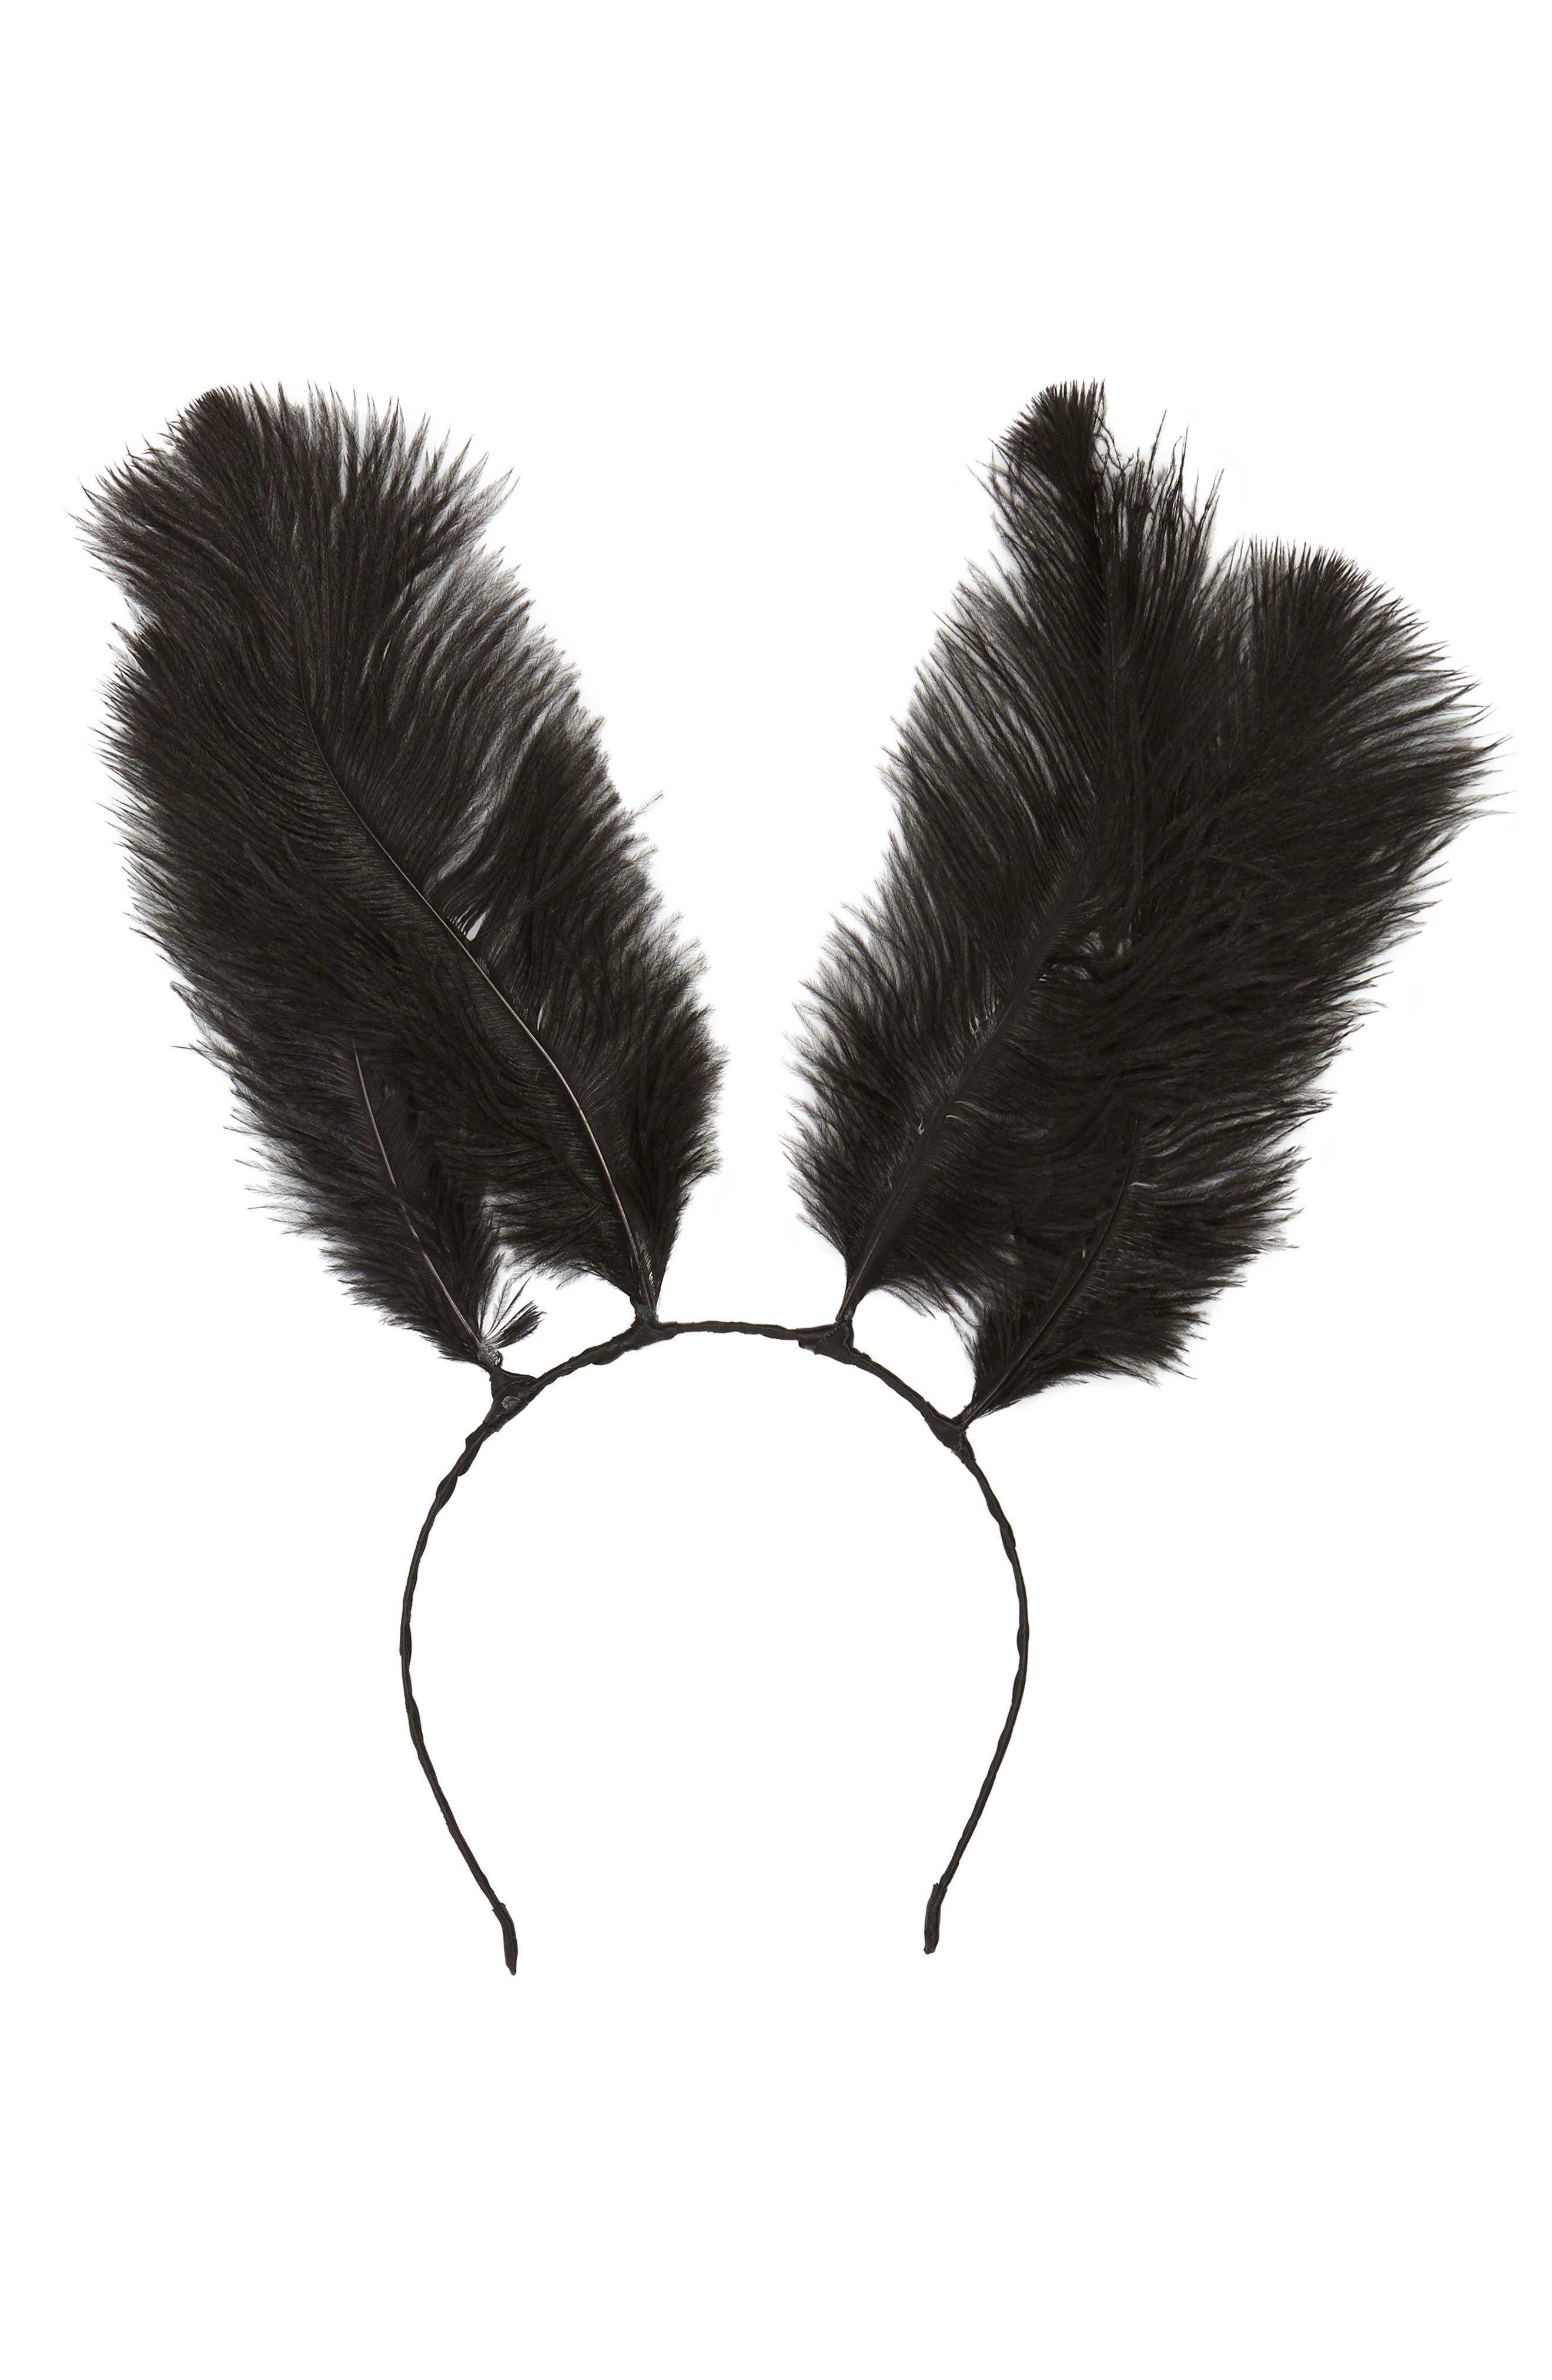 Feather Bunny Ears Headband,                             Main thumbnail 1, color,                             BLACK